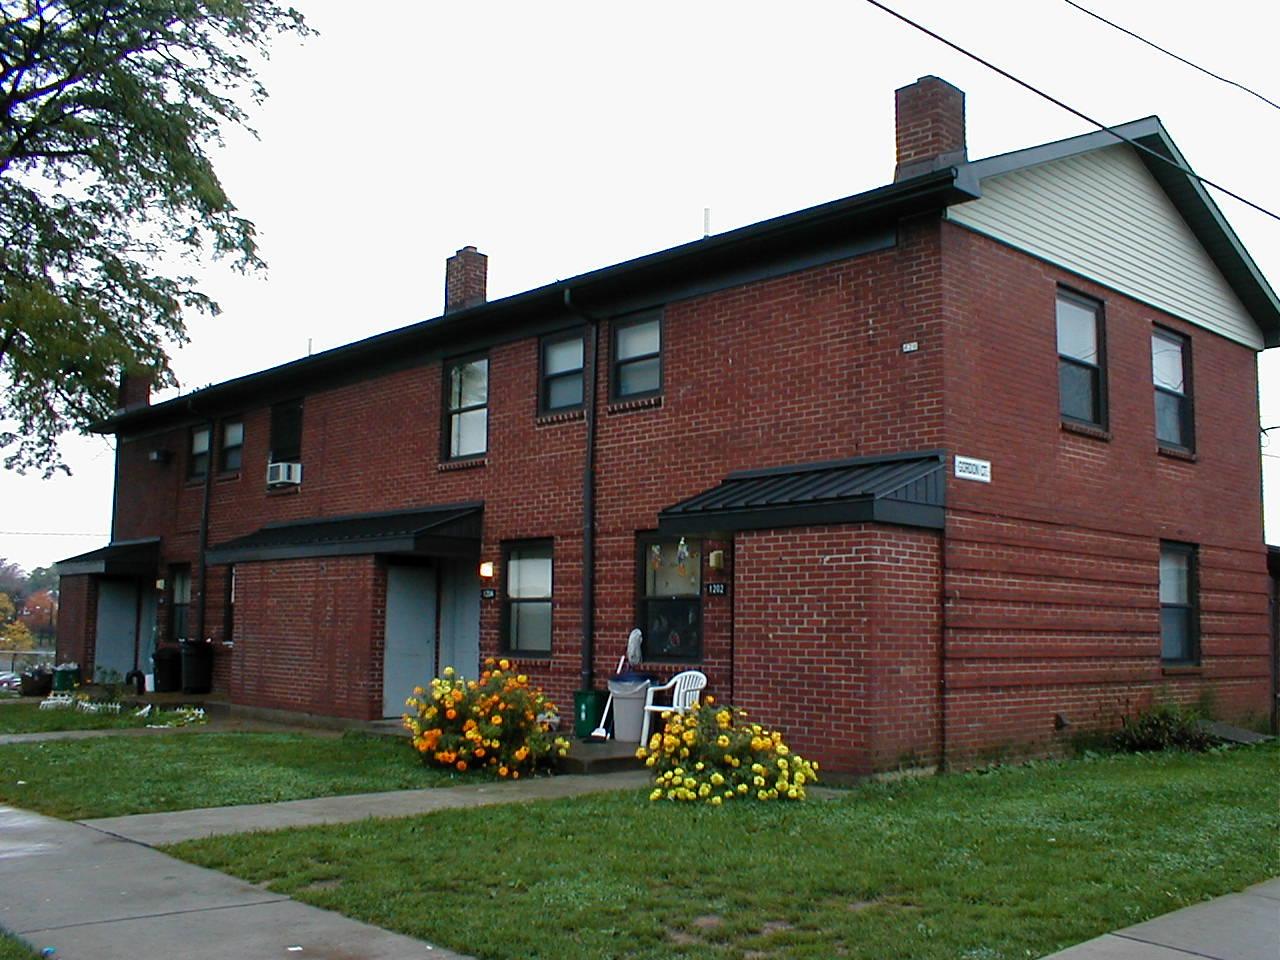 Image of Pembroke in Bethlehem, Pennsylvania